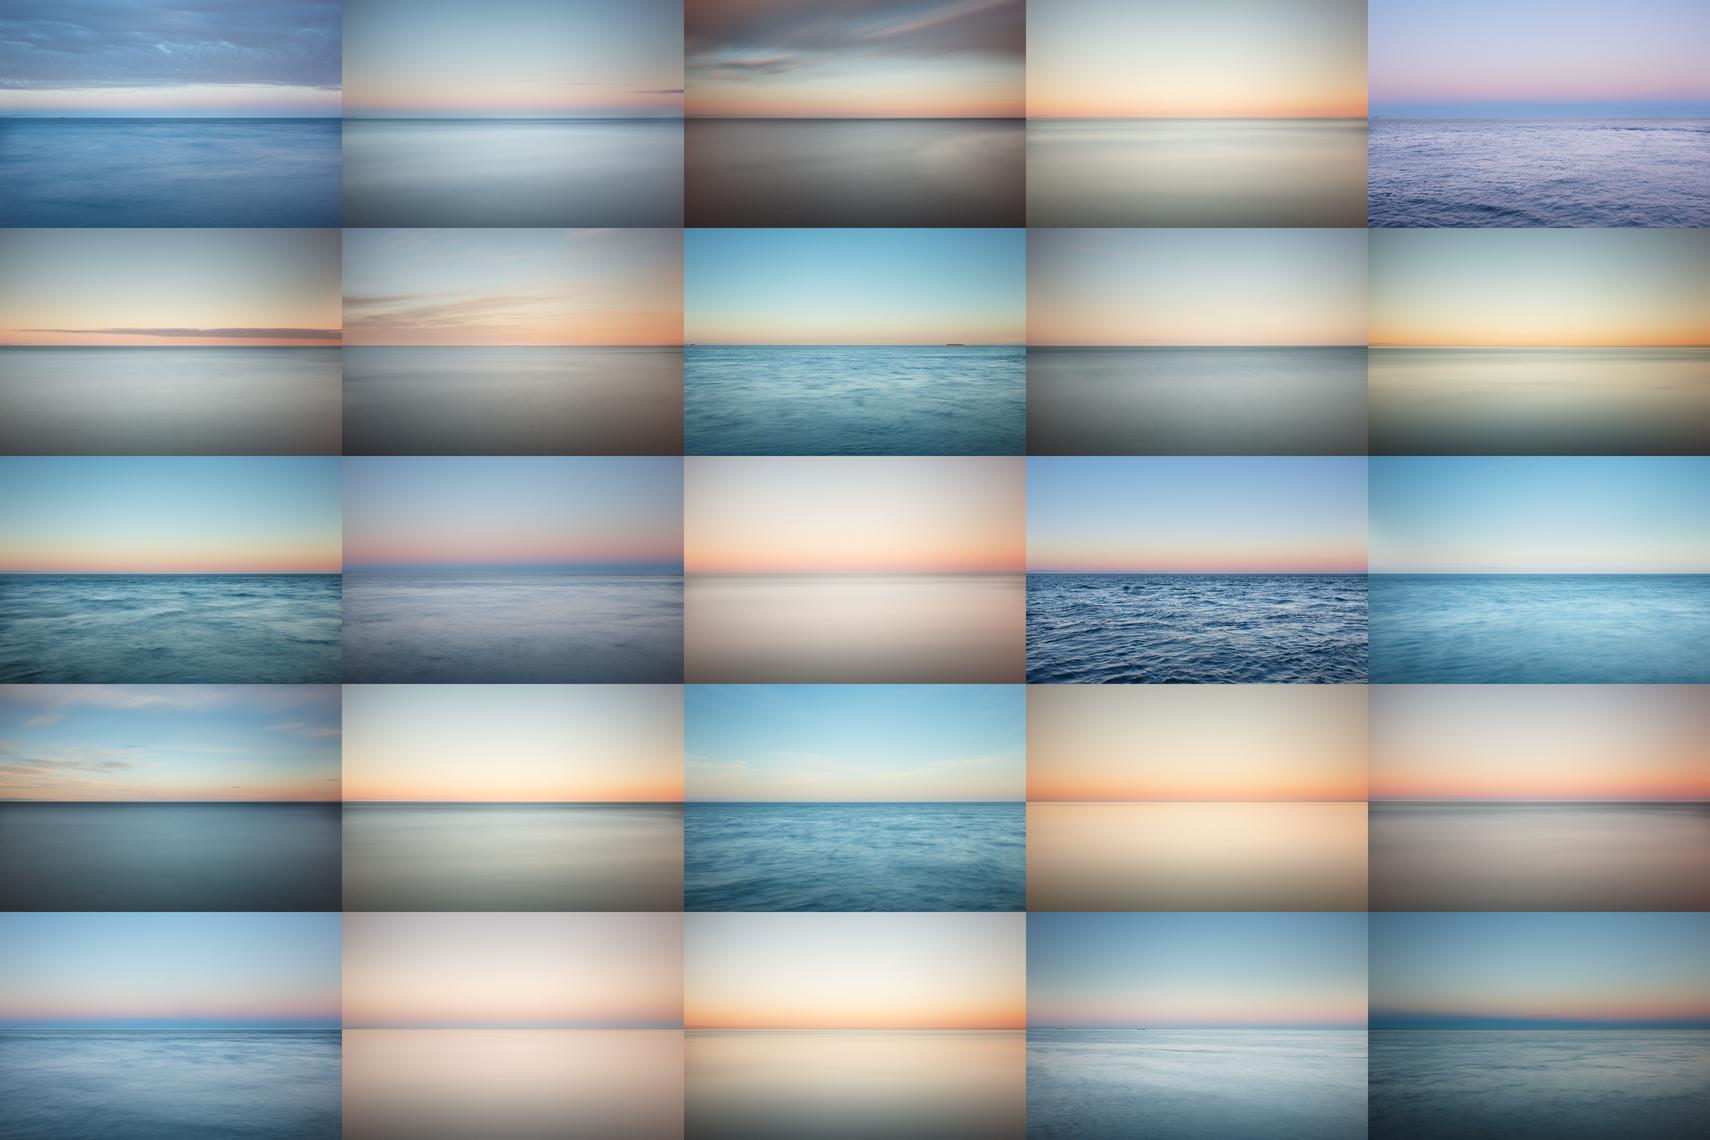 DavidEllingsen-WeatherPatterns-2017DissipatingHeatSummerEvenings